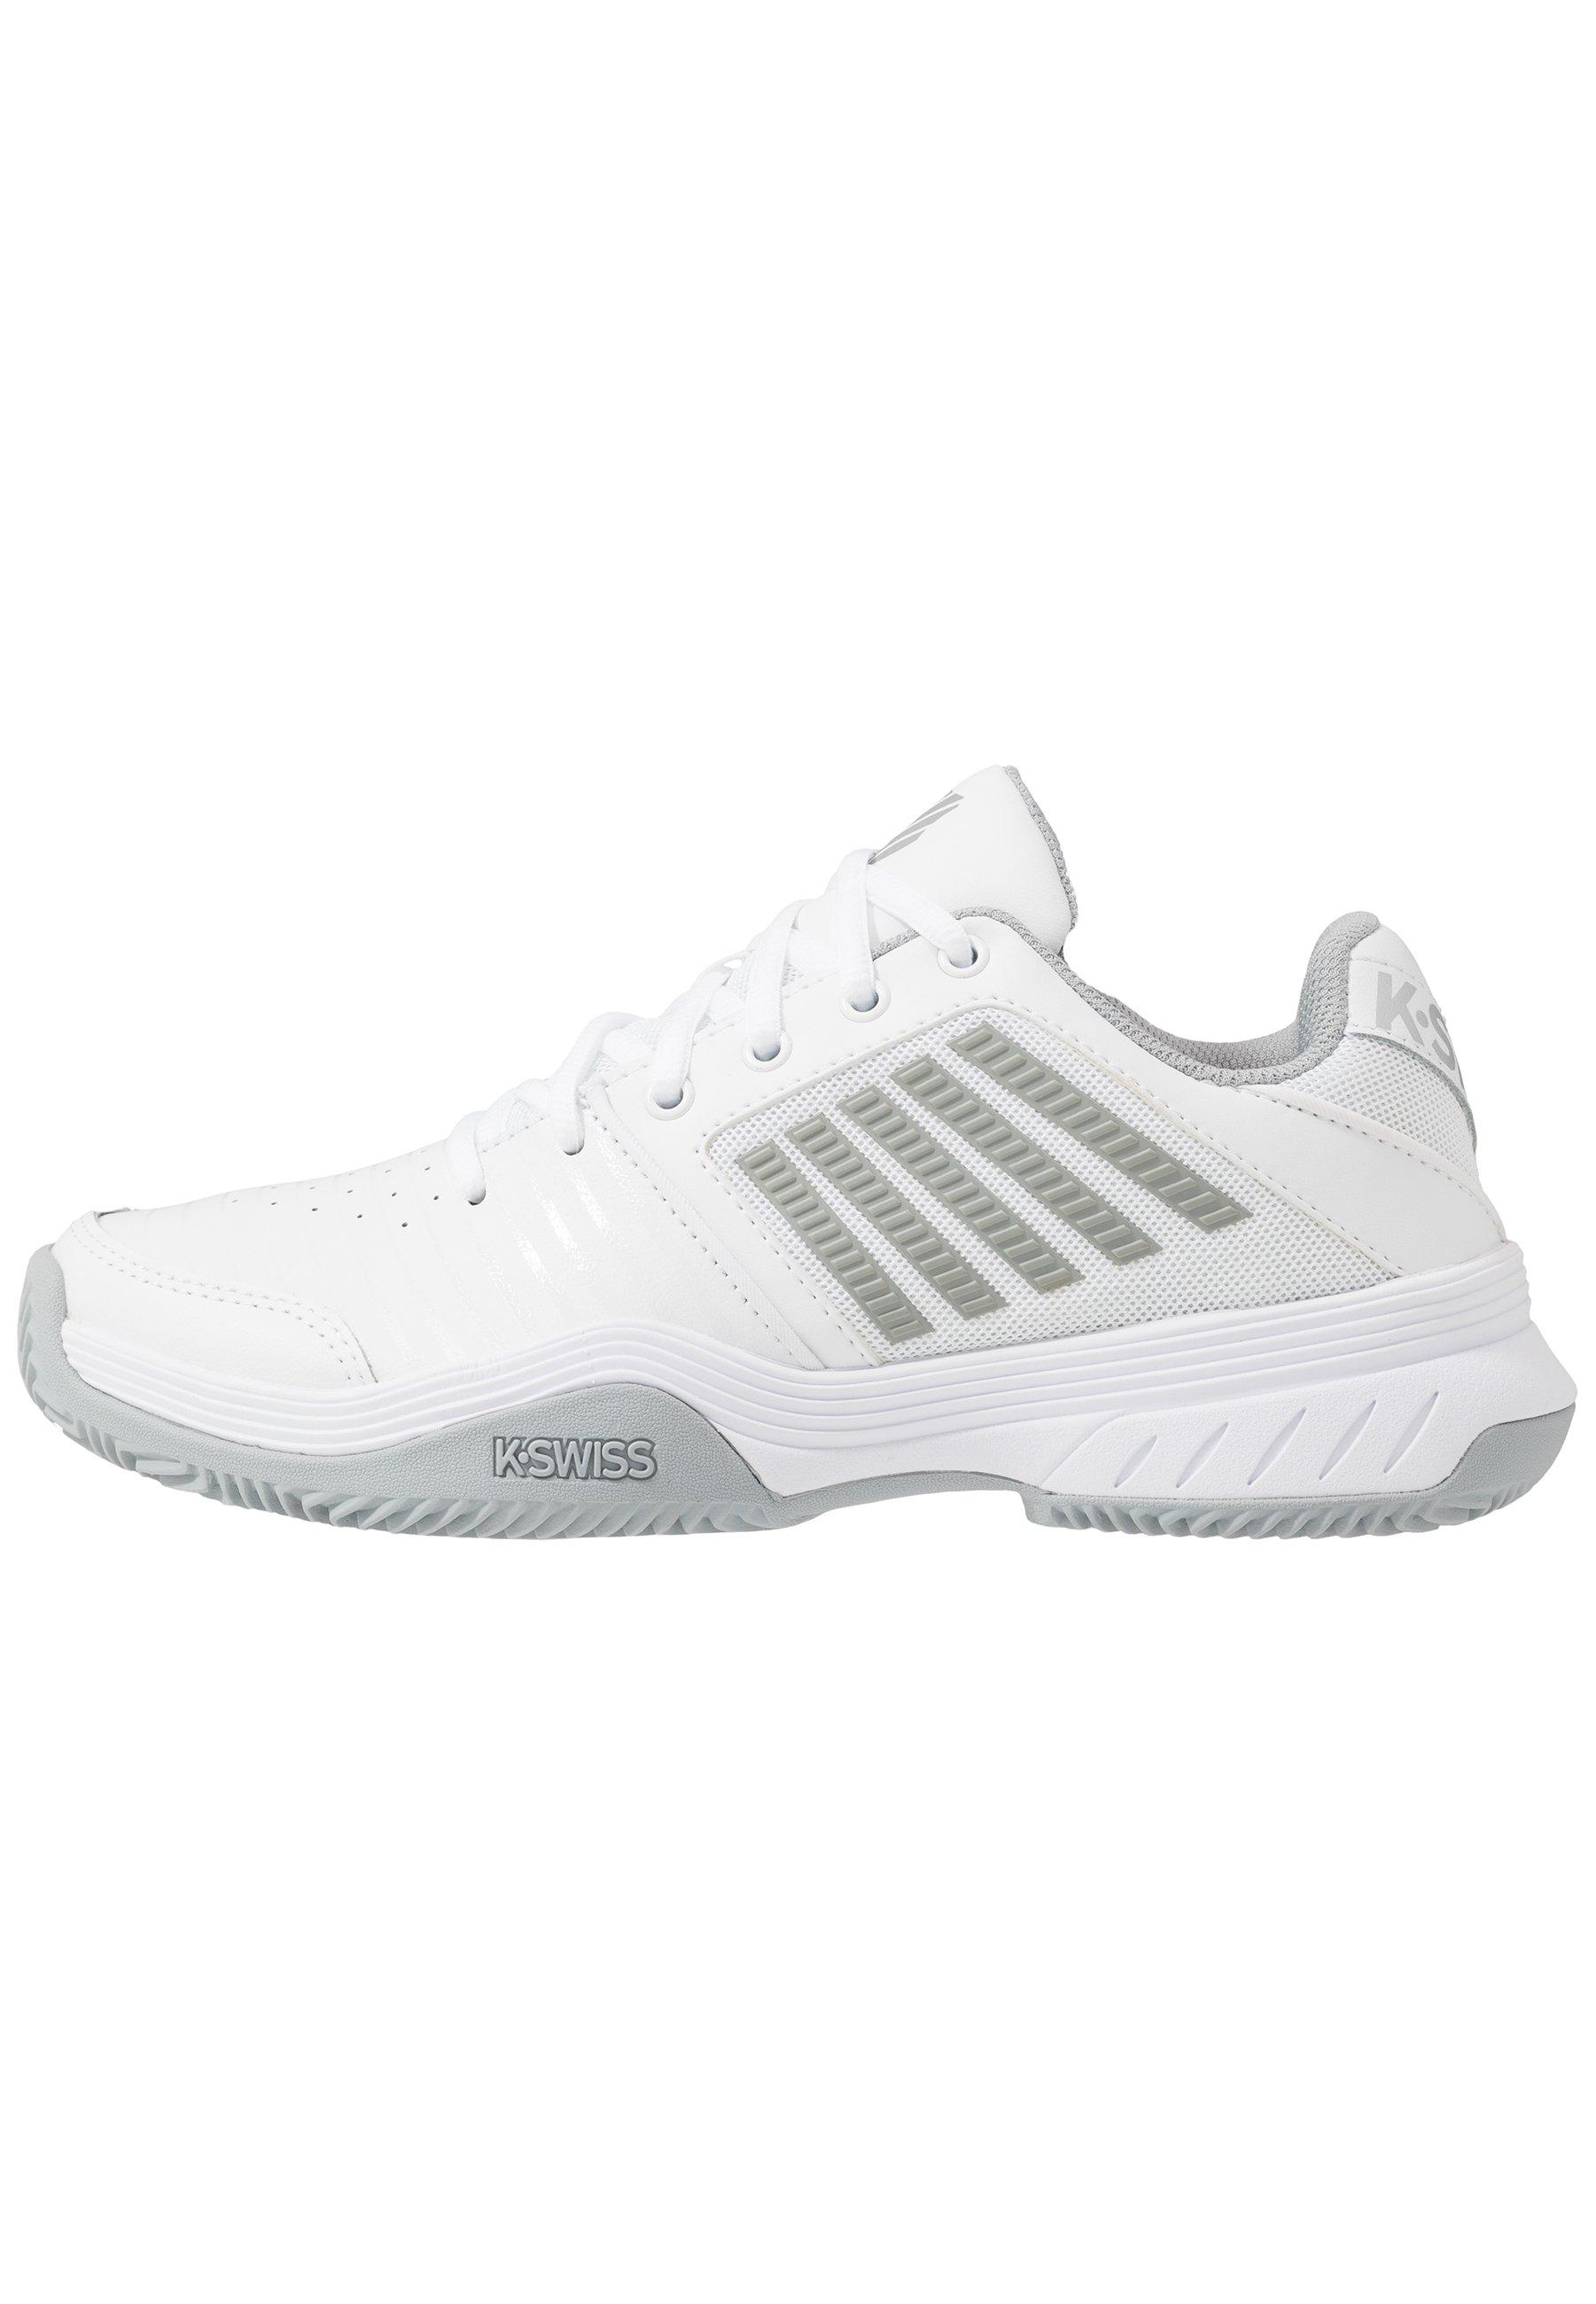 Women COURT EXPRESS - Clay court tennis shoes